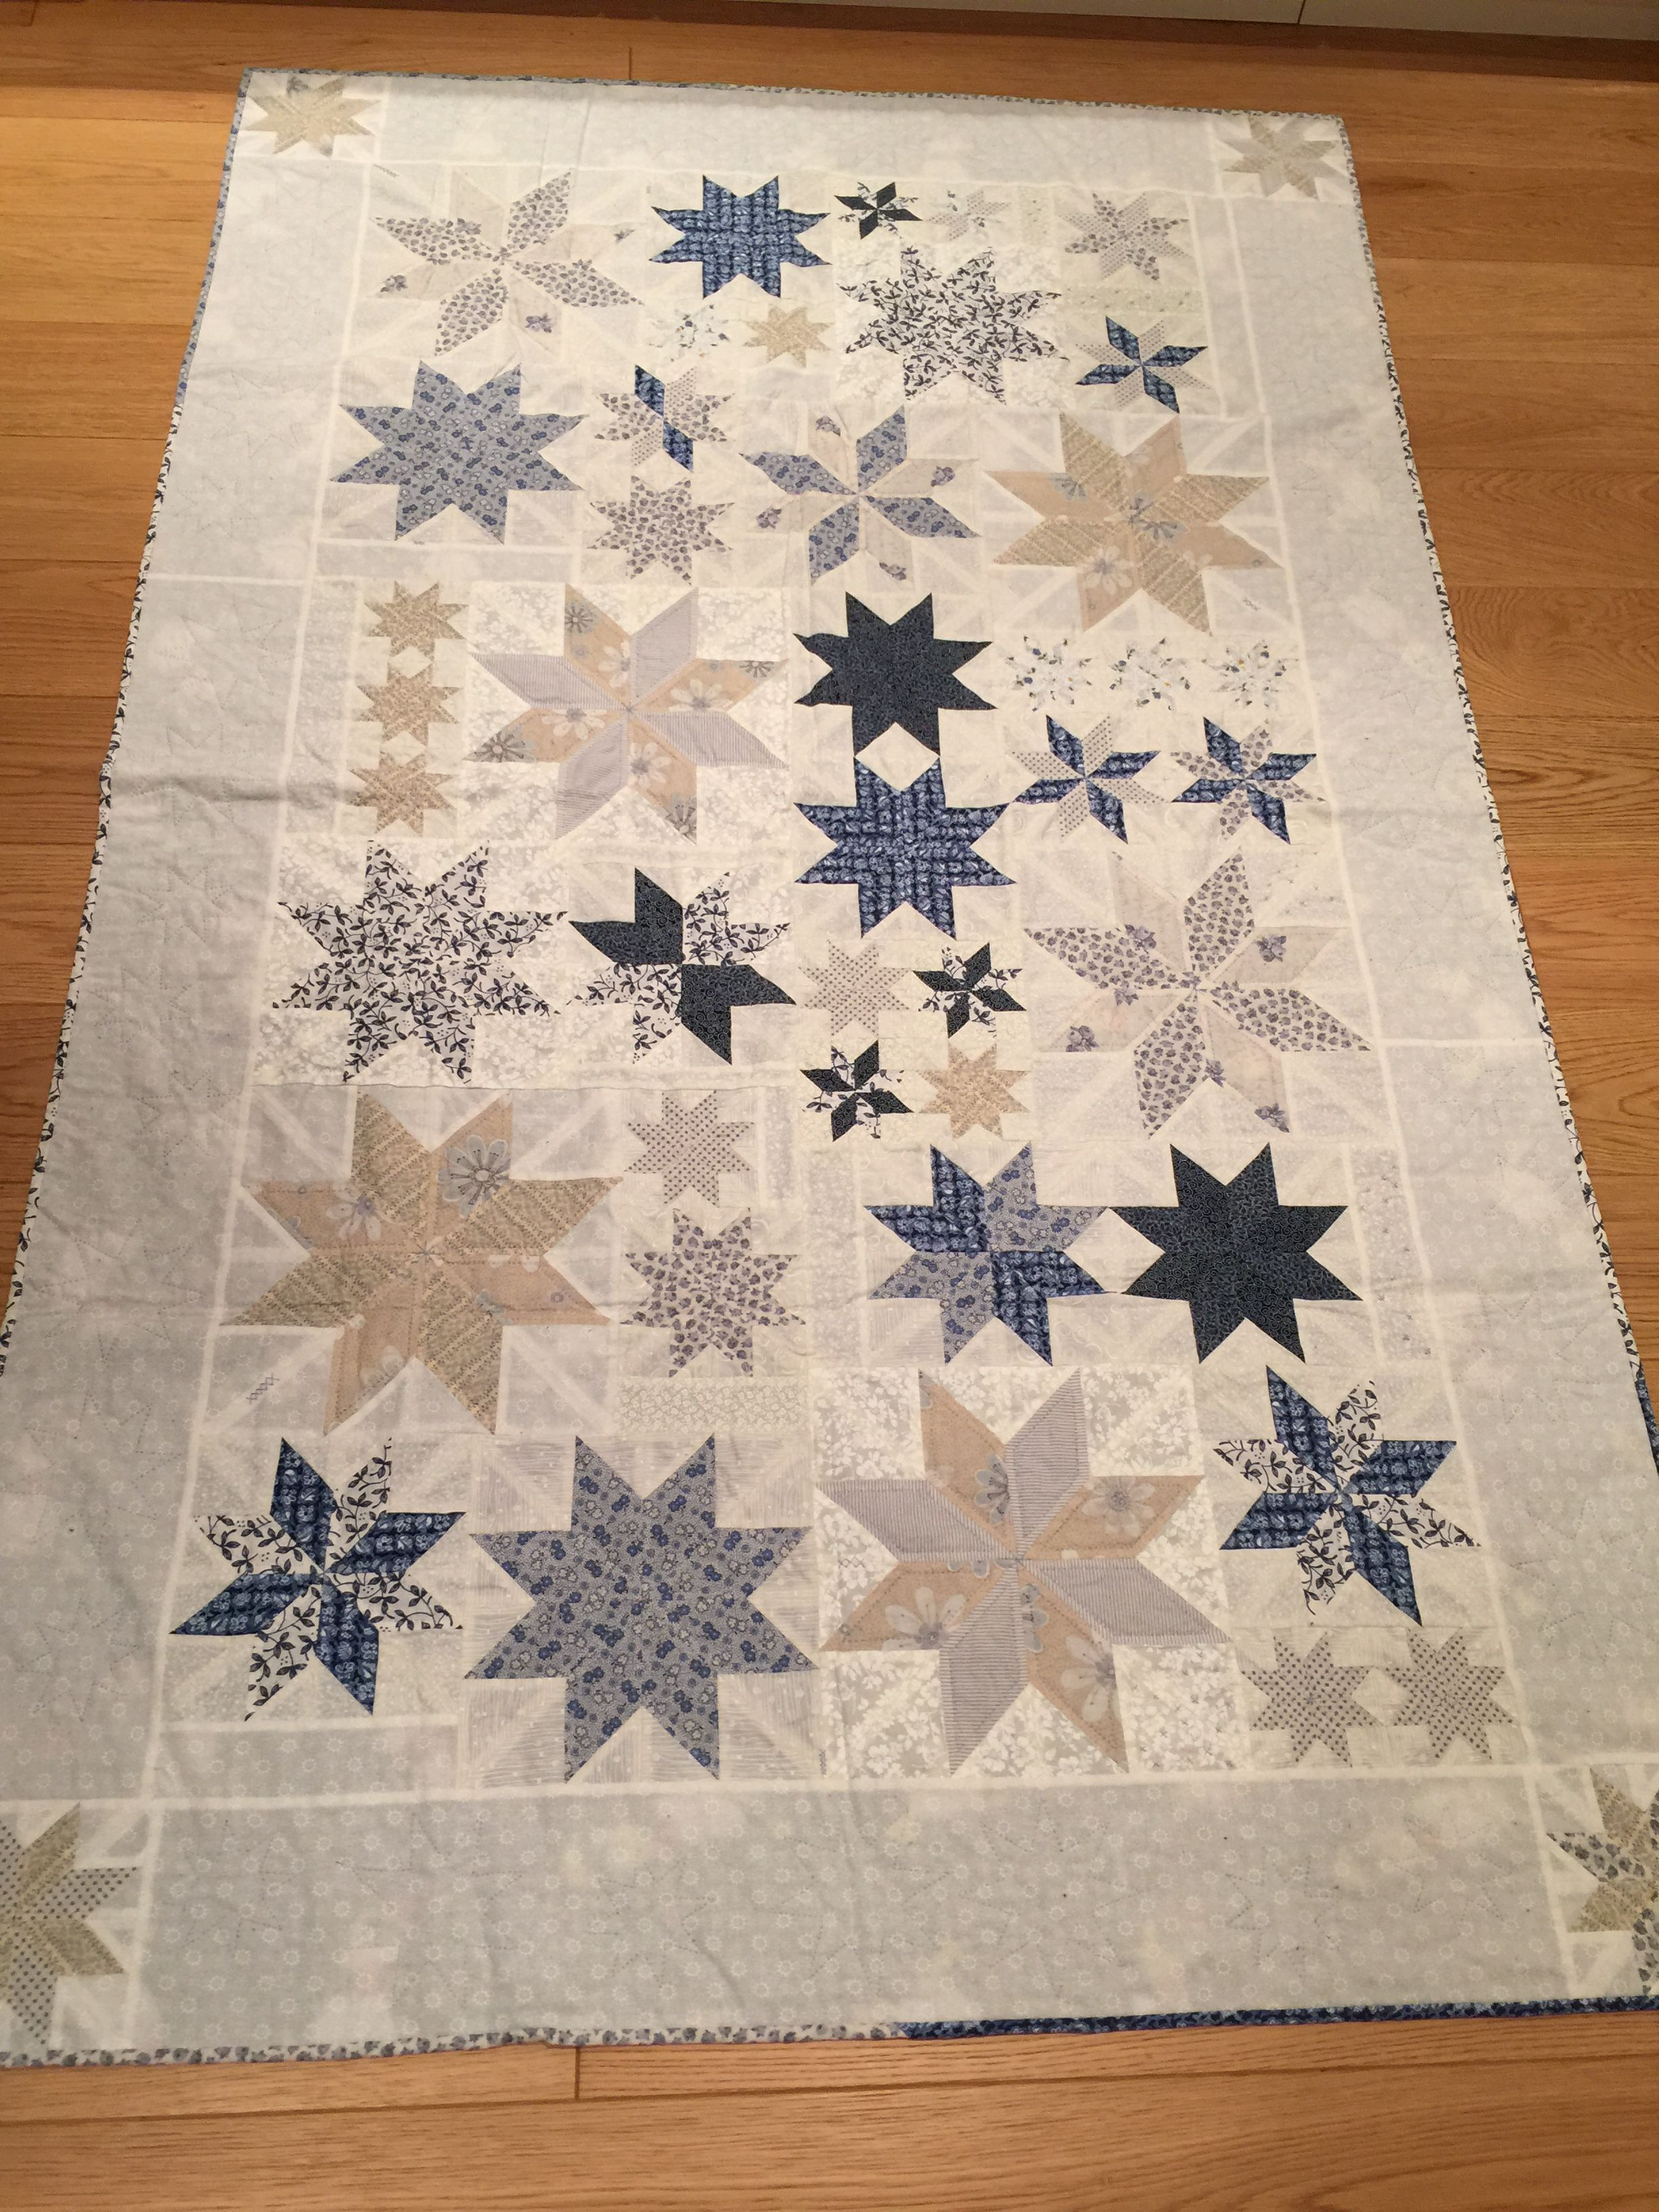 A Lemoyne Star Variation Made In Sweden Using Our Rapid Fire Lemoyne Star Tool Star Quilt Blocks Moon Quilt Quilt Patterns